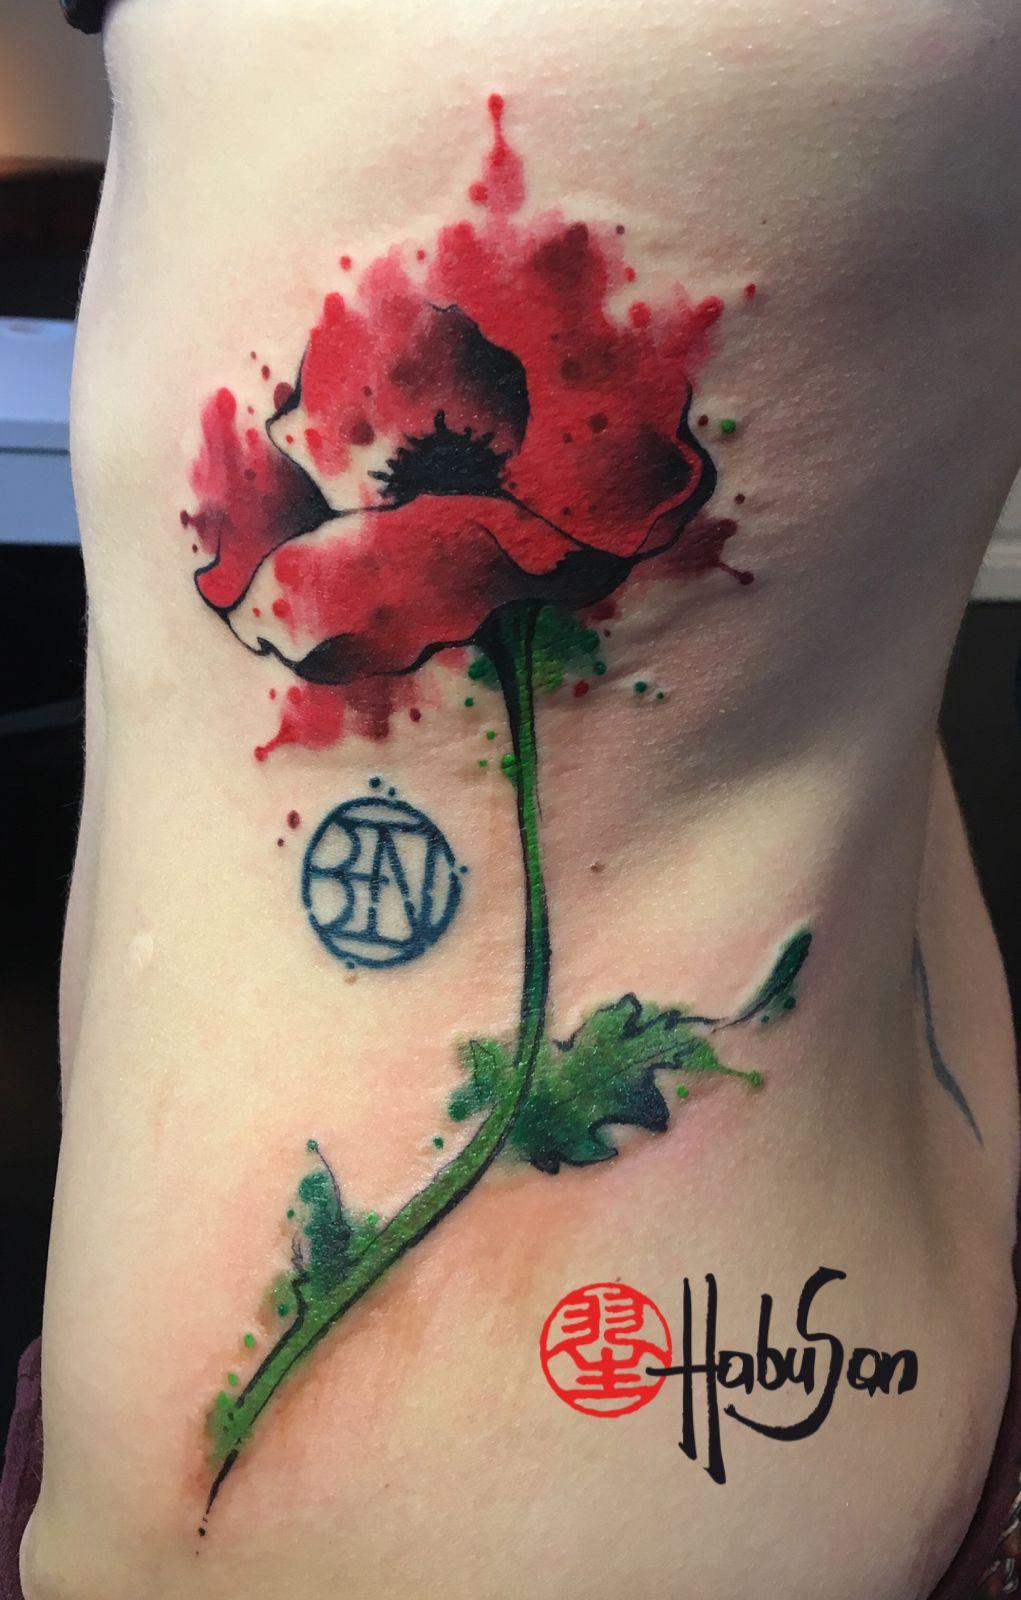 Mohnblume Watercolour Tattoo Mohnblume Aquarell Blumen Tattoos Aquarell Tattoos